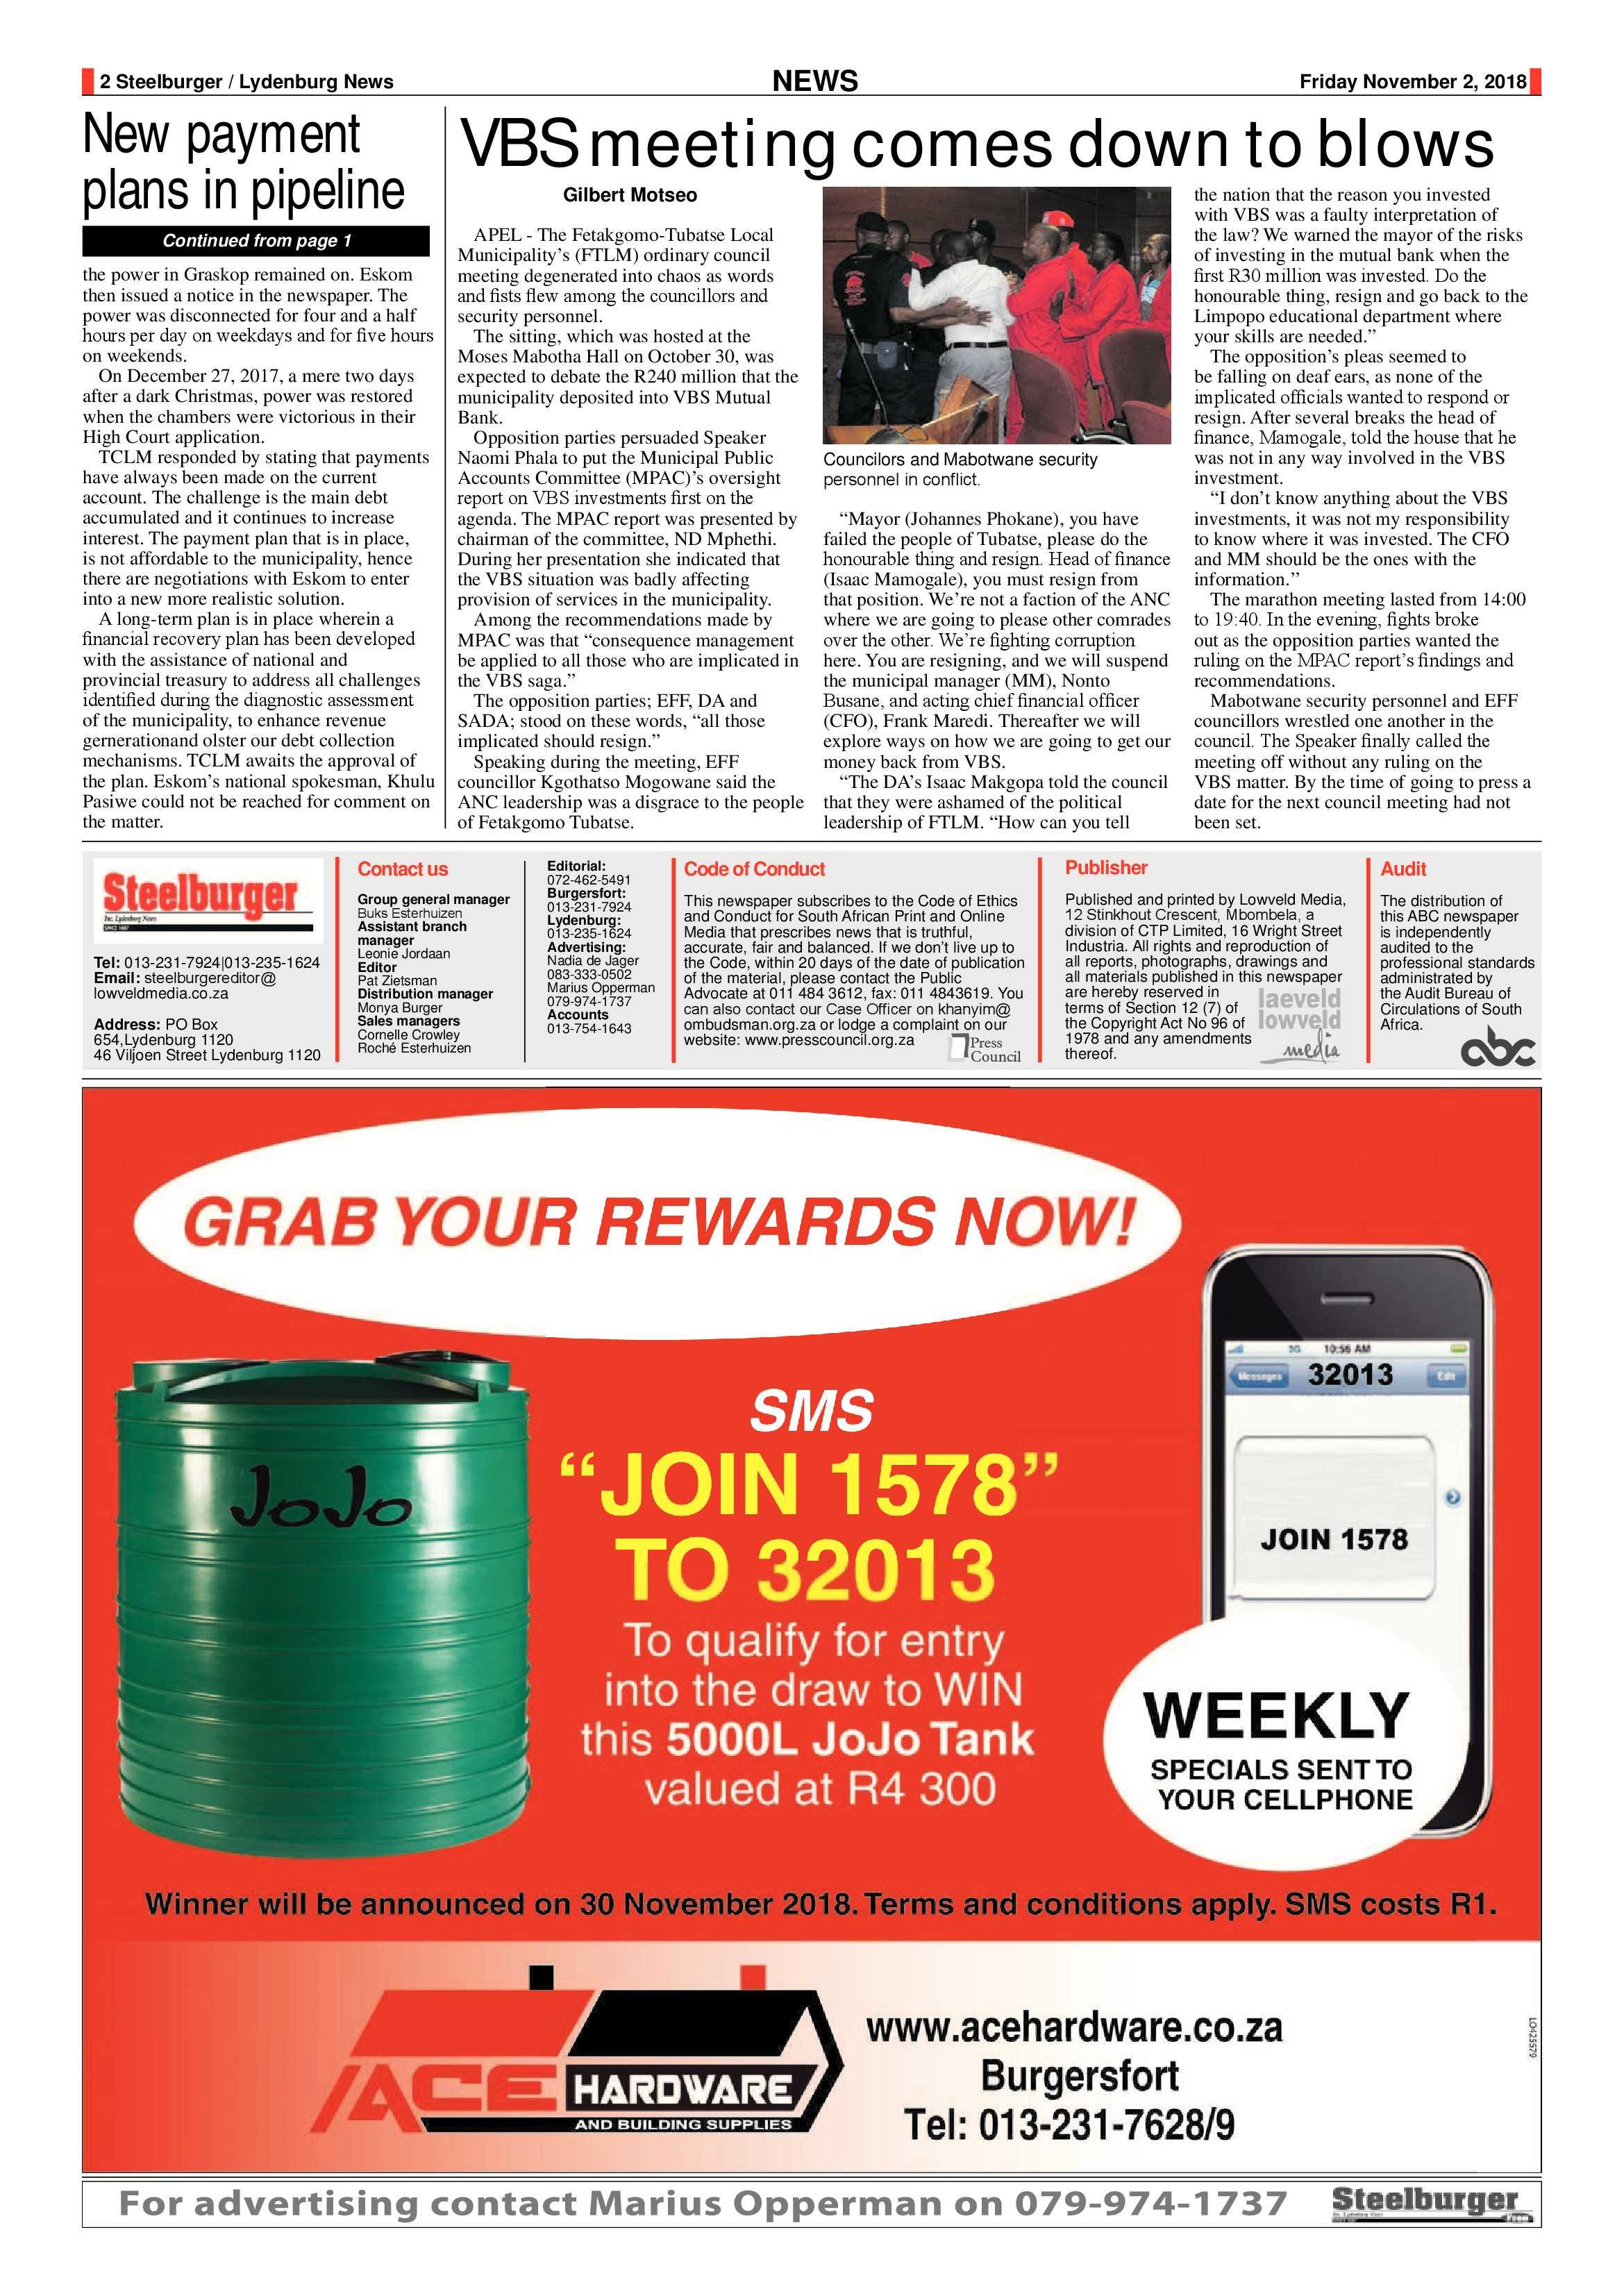 steelburger-news-2-november-2018-epapers-page-2